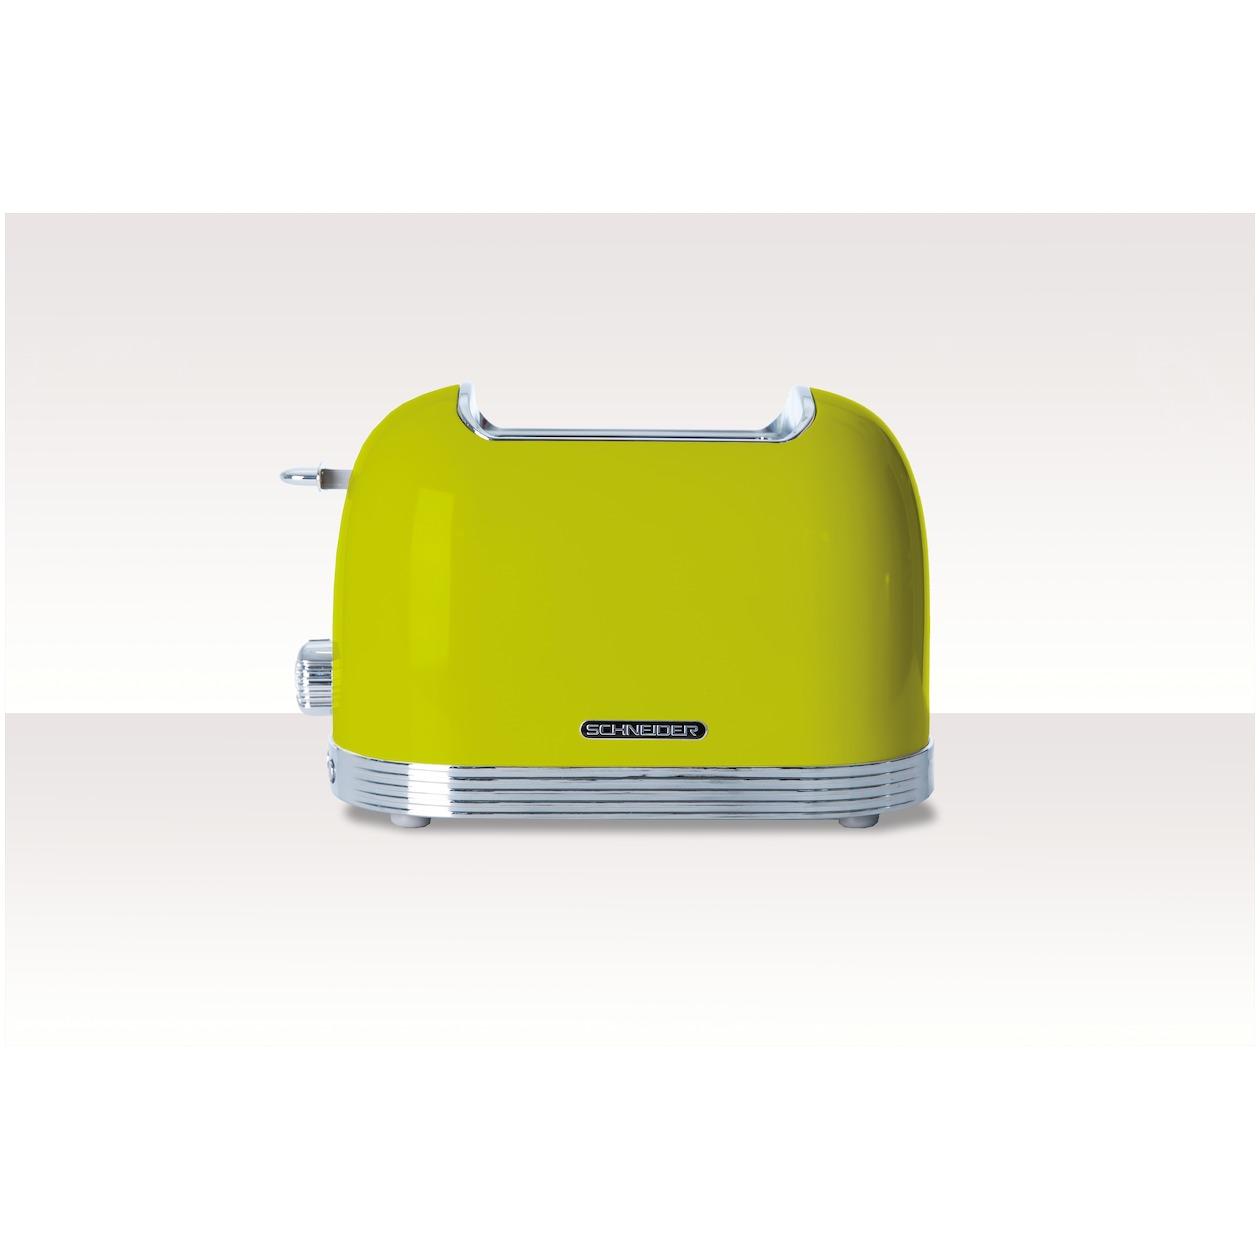 Schneider broodrooster SL T2.2 LG limegroen